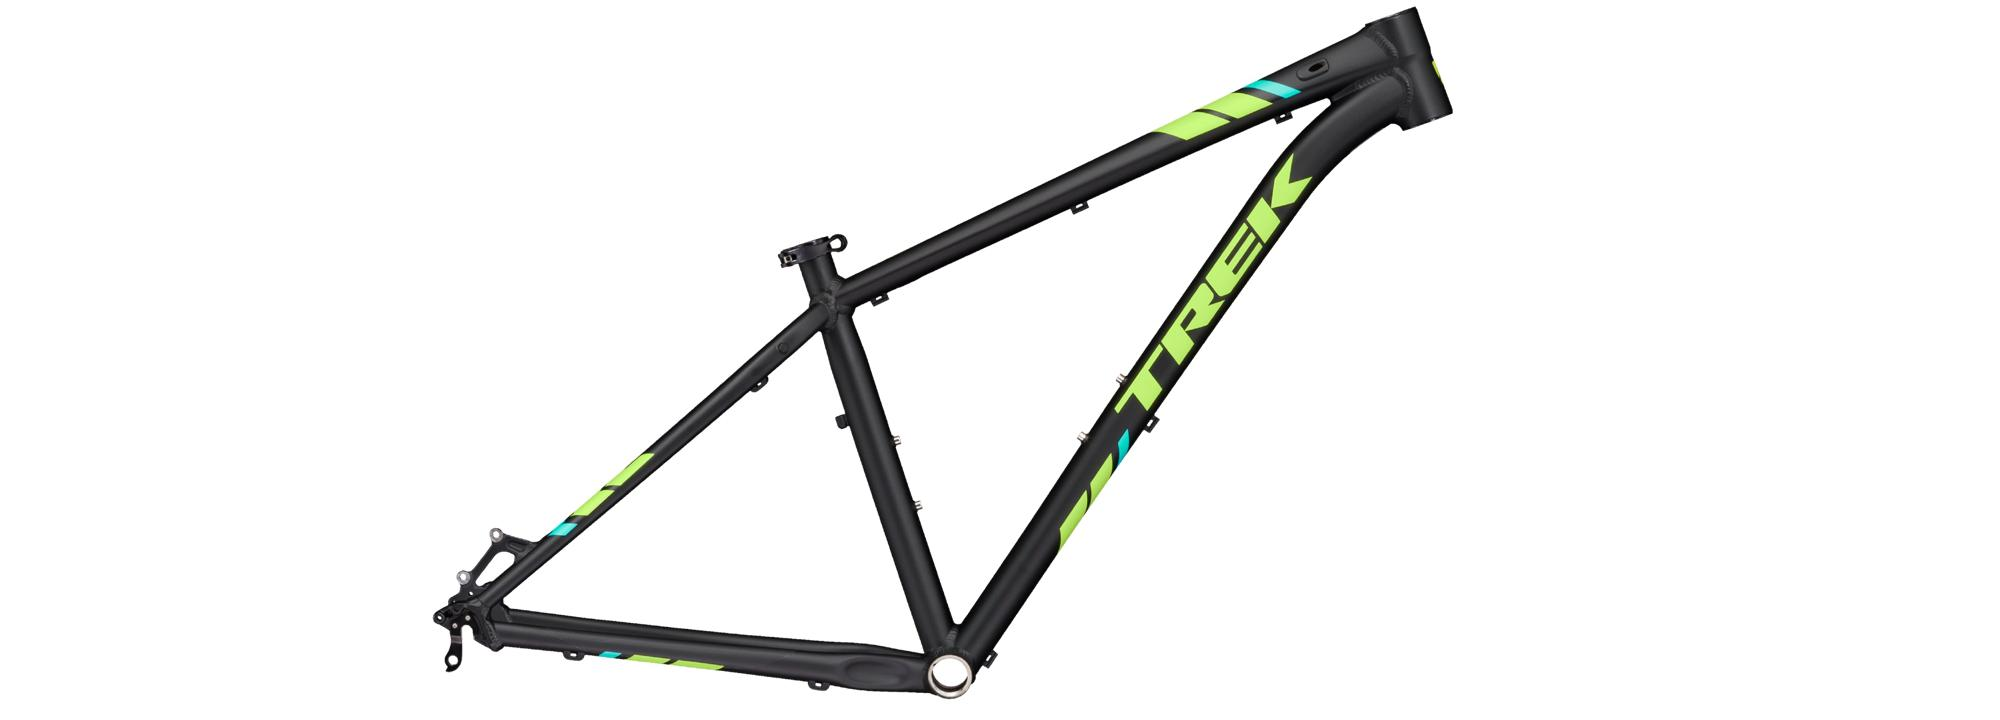 Trek X-Caliber Frameset Mountainbike Rahmen Hardtail Fully 2018